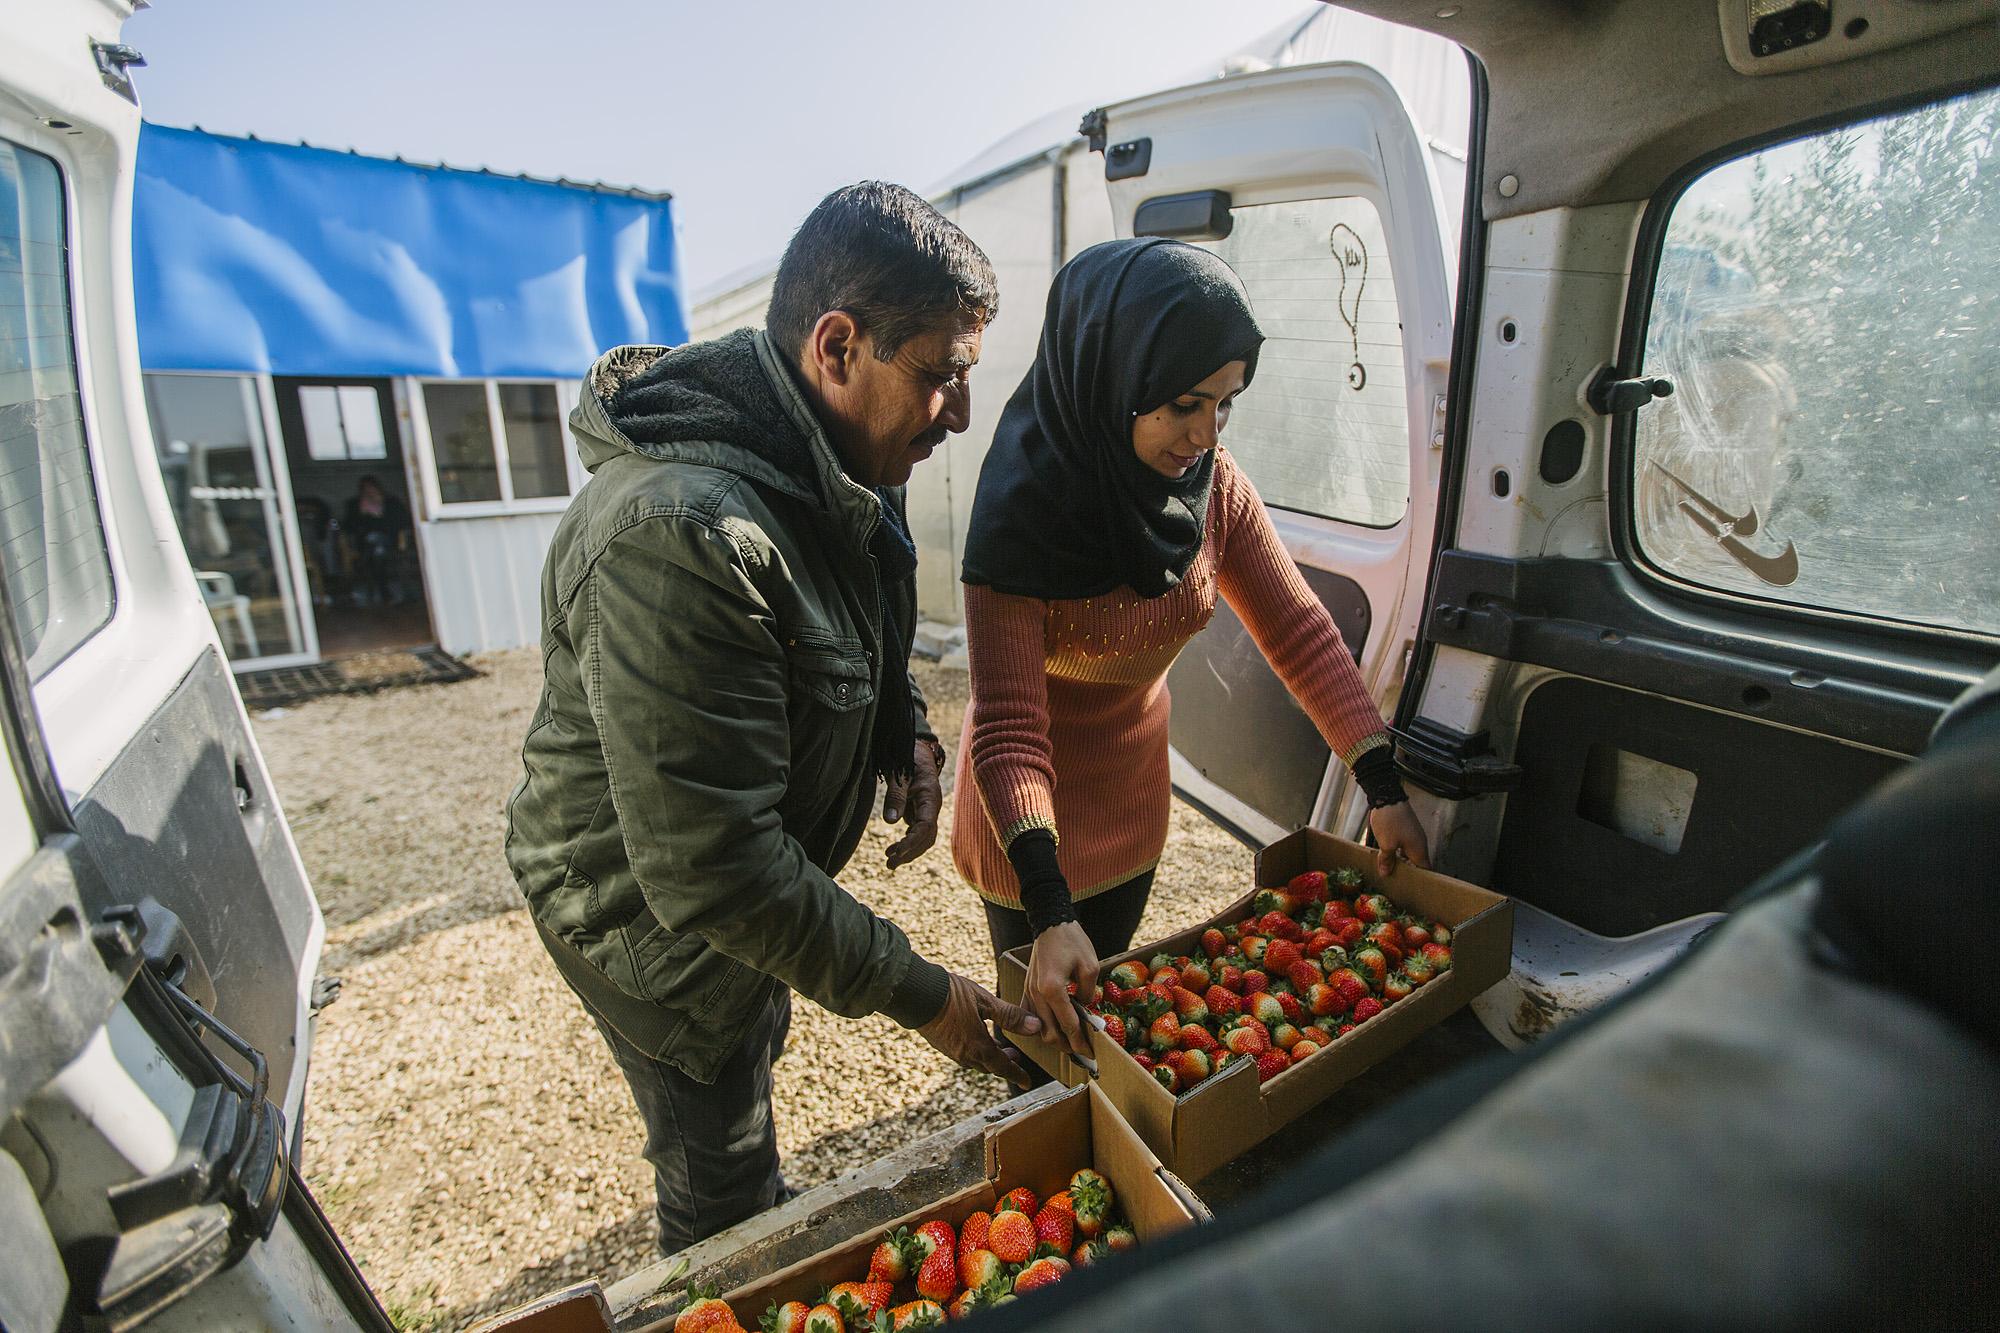 USAID-Israel-Day5-Strawberries-_07A7964.jpg